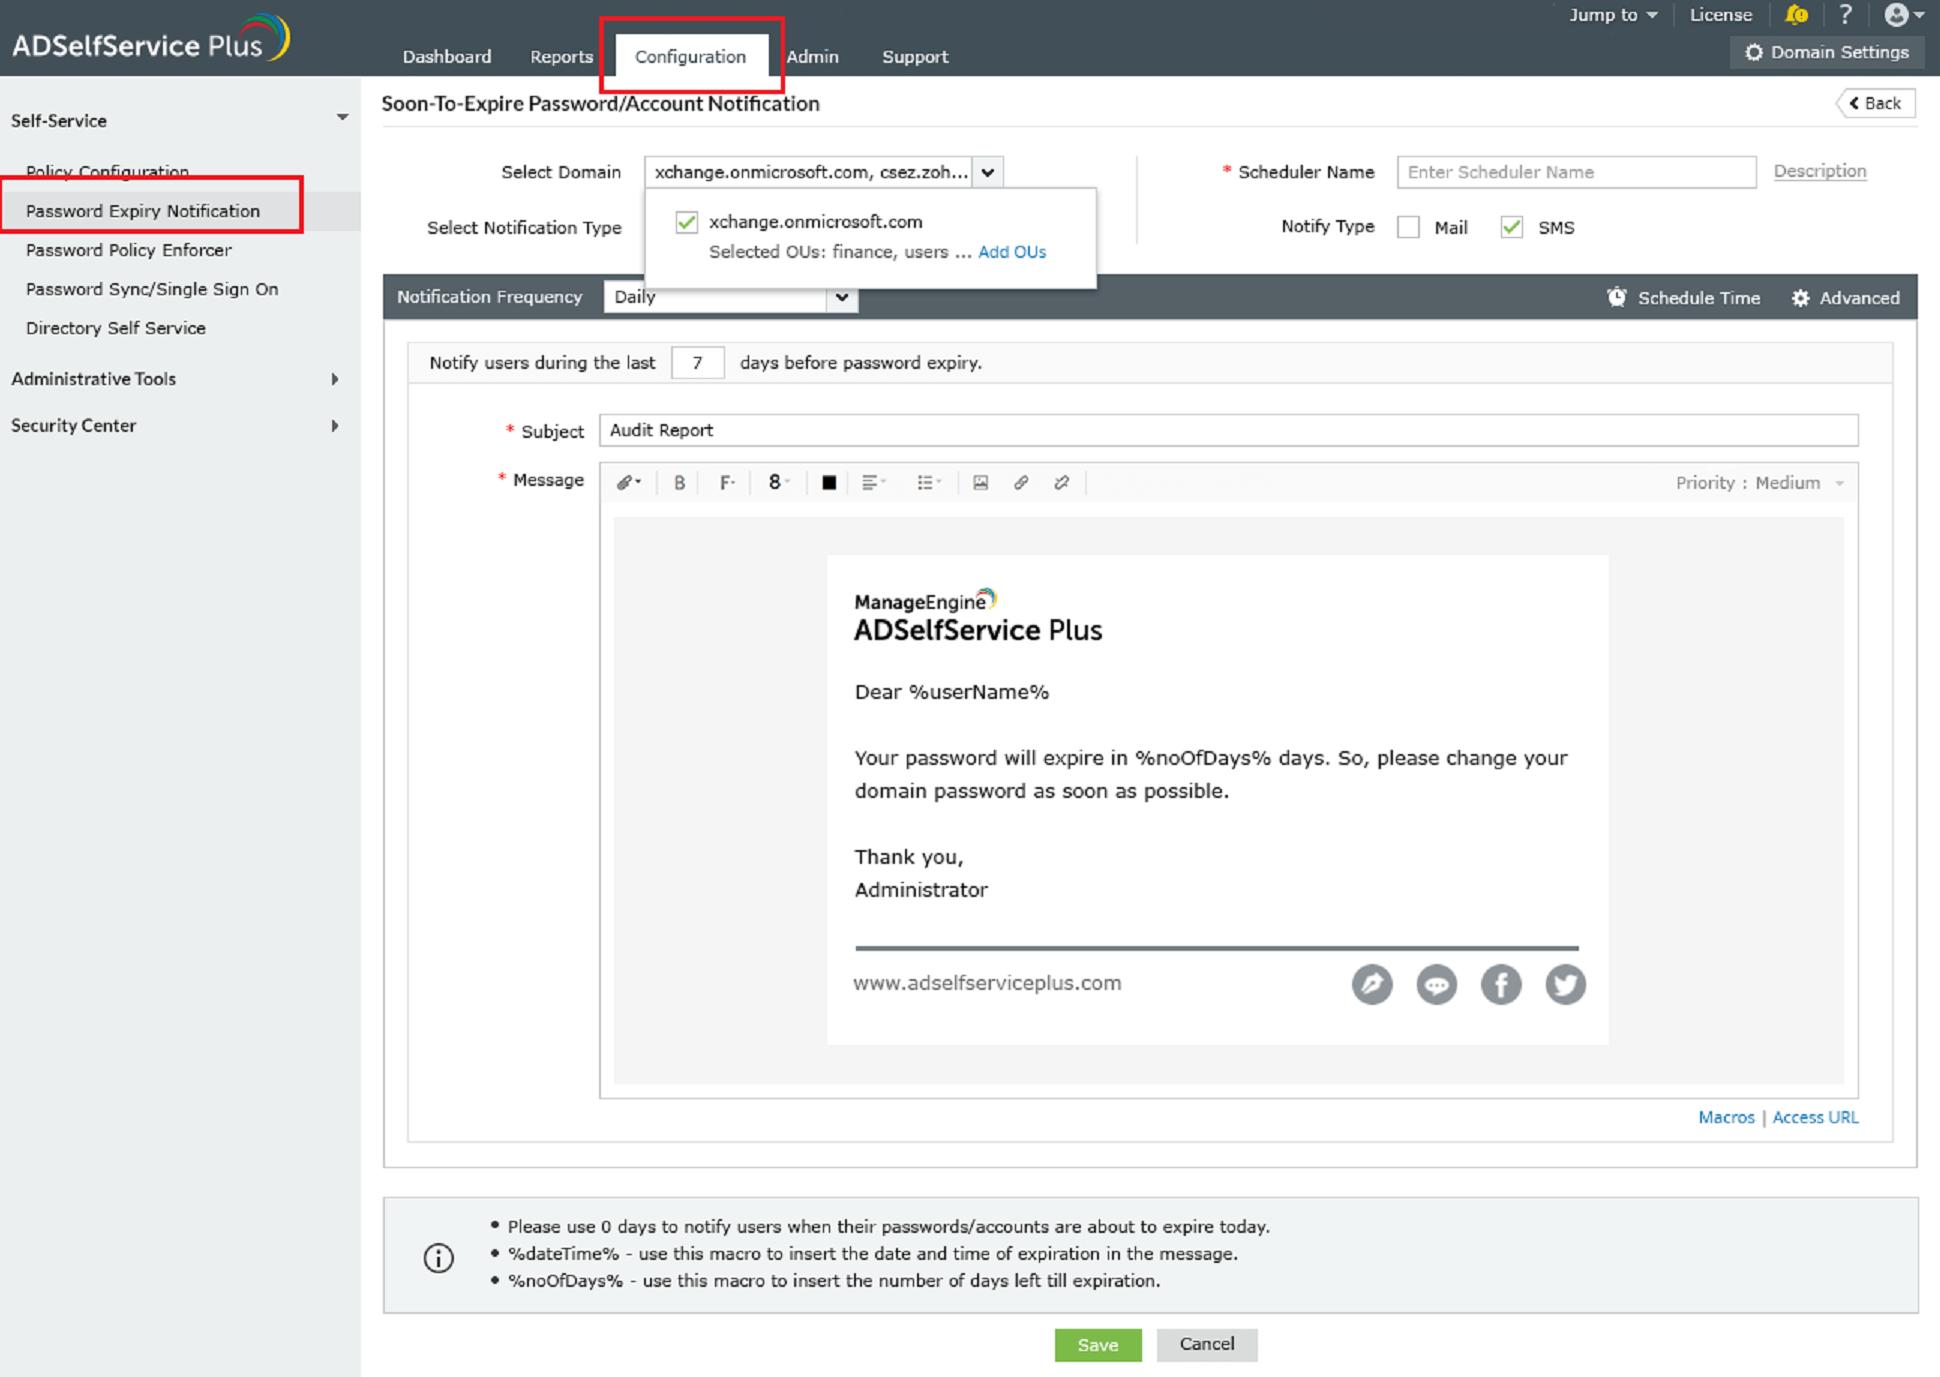 password-expiry-email-notification-tool